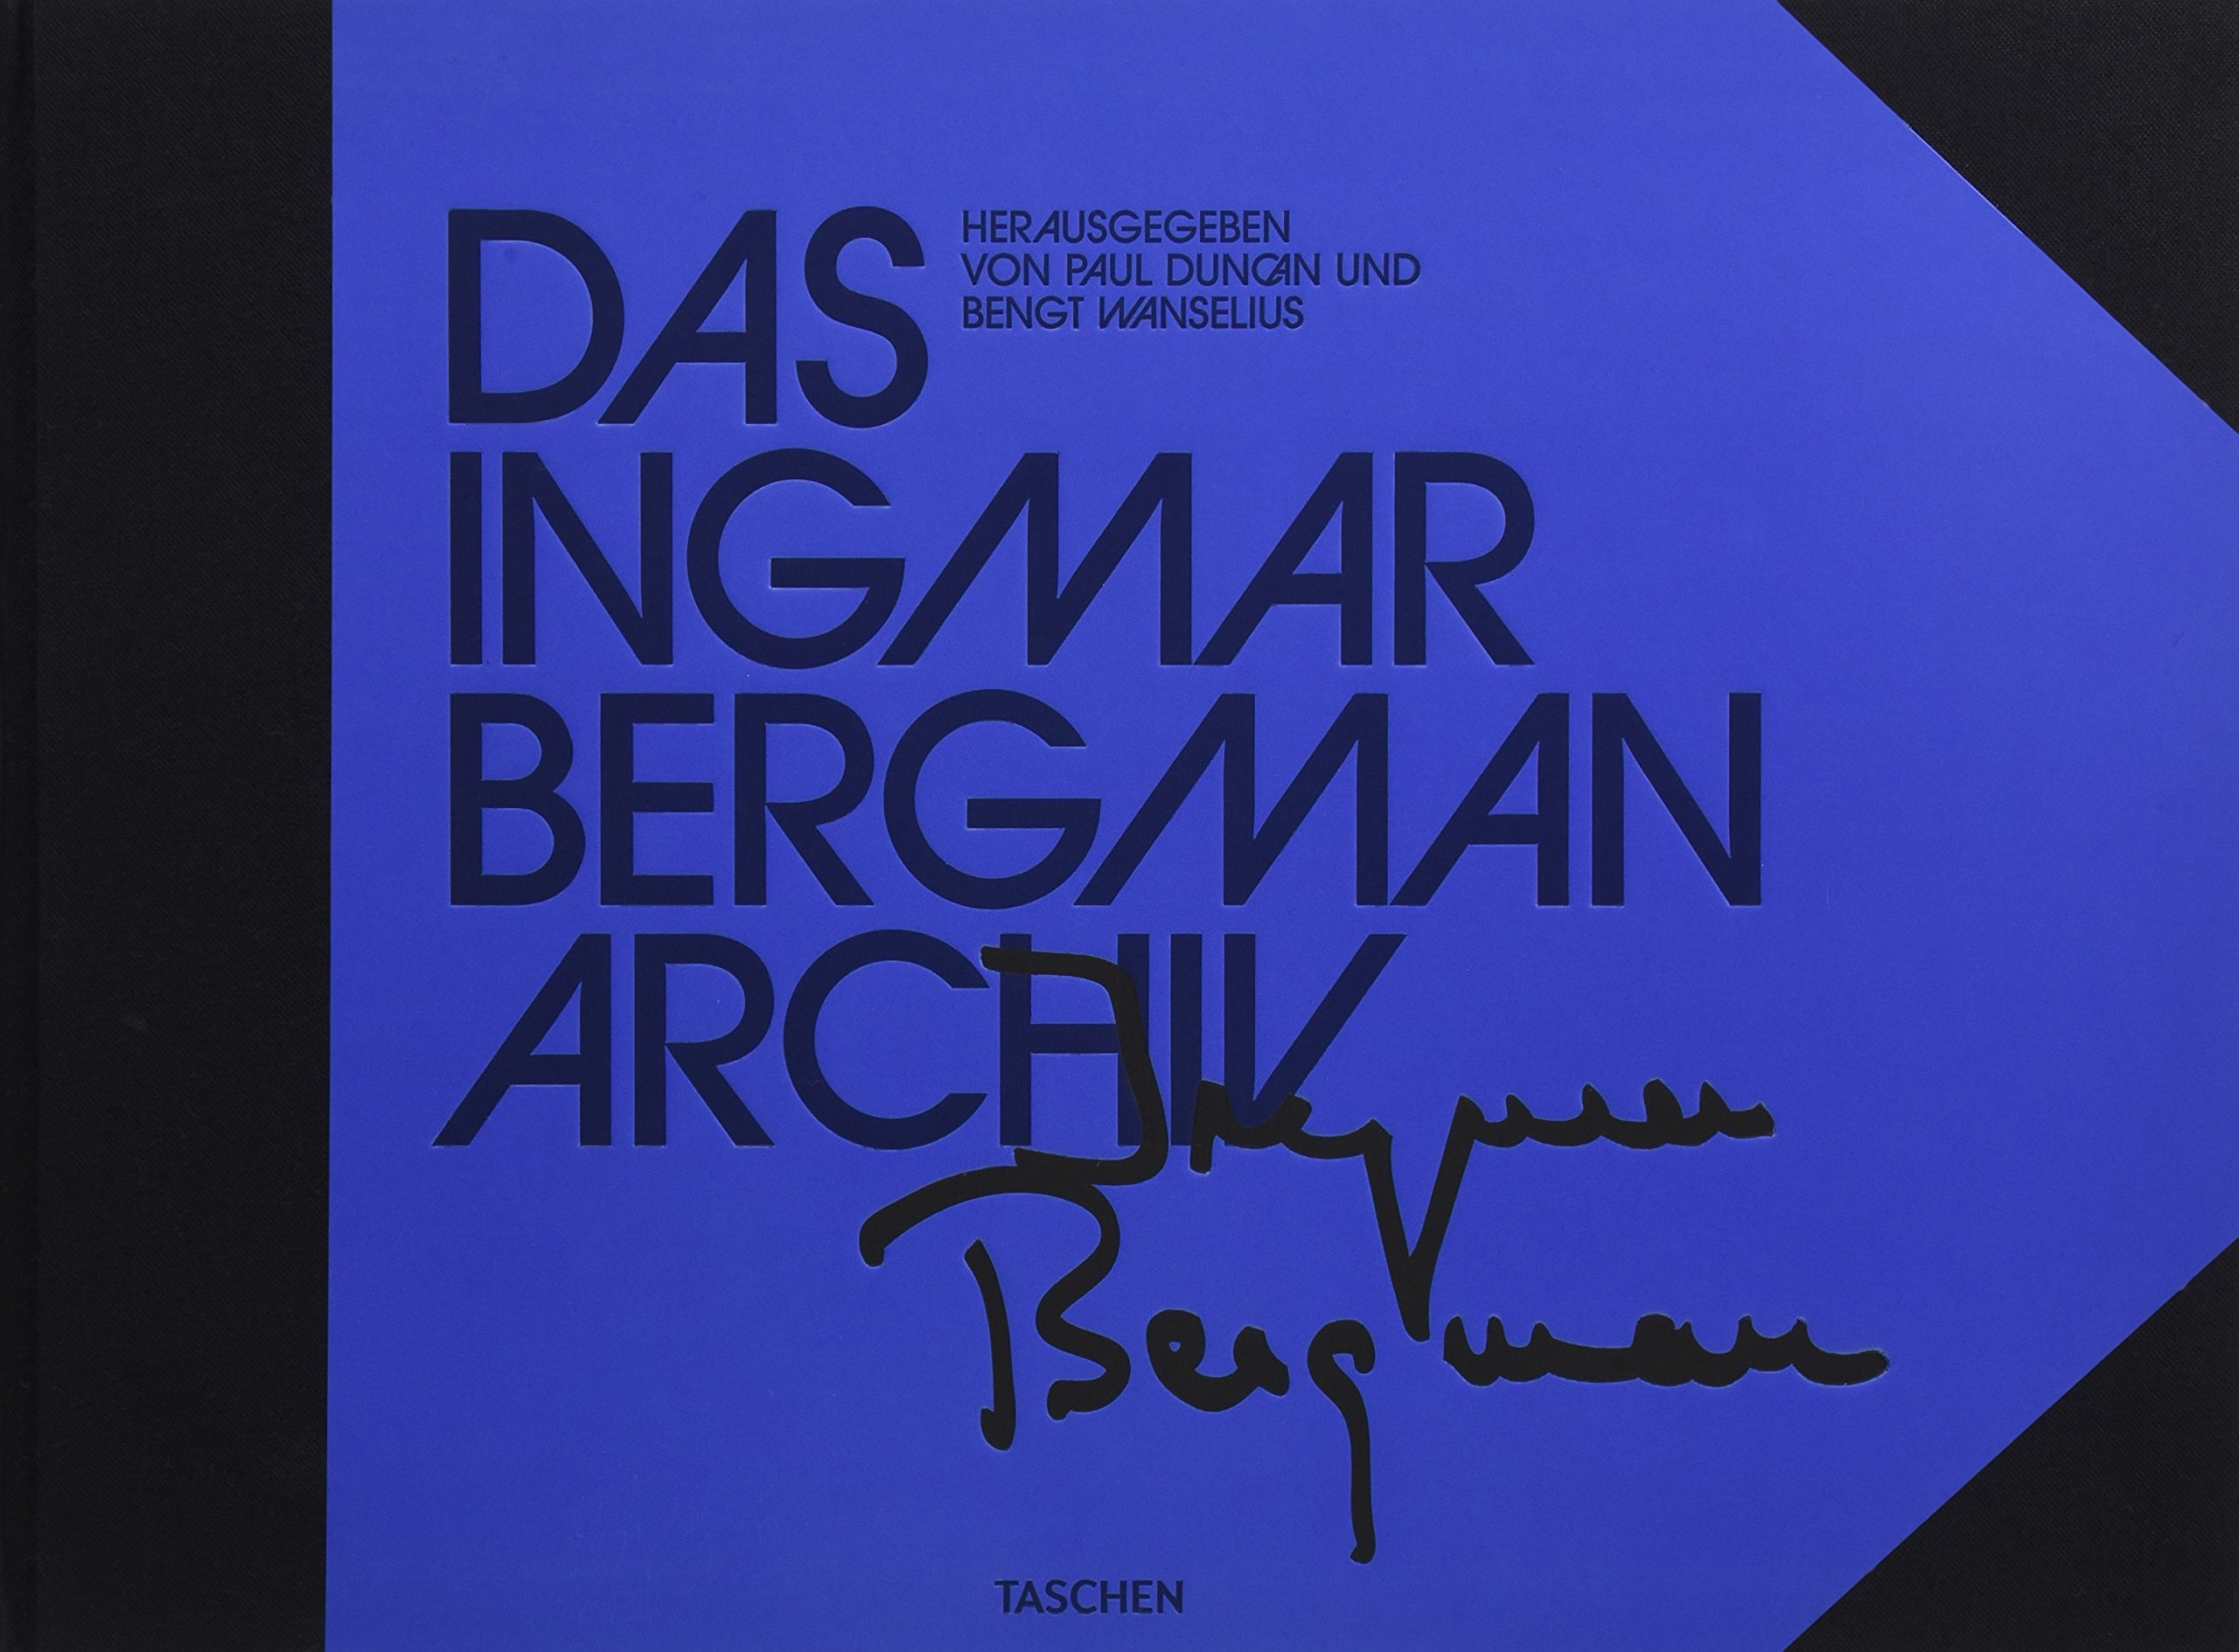 Das Ingmar Bergman Archiv Gebundenes Buch – 27. April 2018 Paul Duncan Bengt Wanselius TASCHEN 3836568675